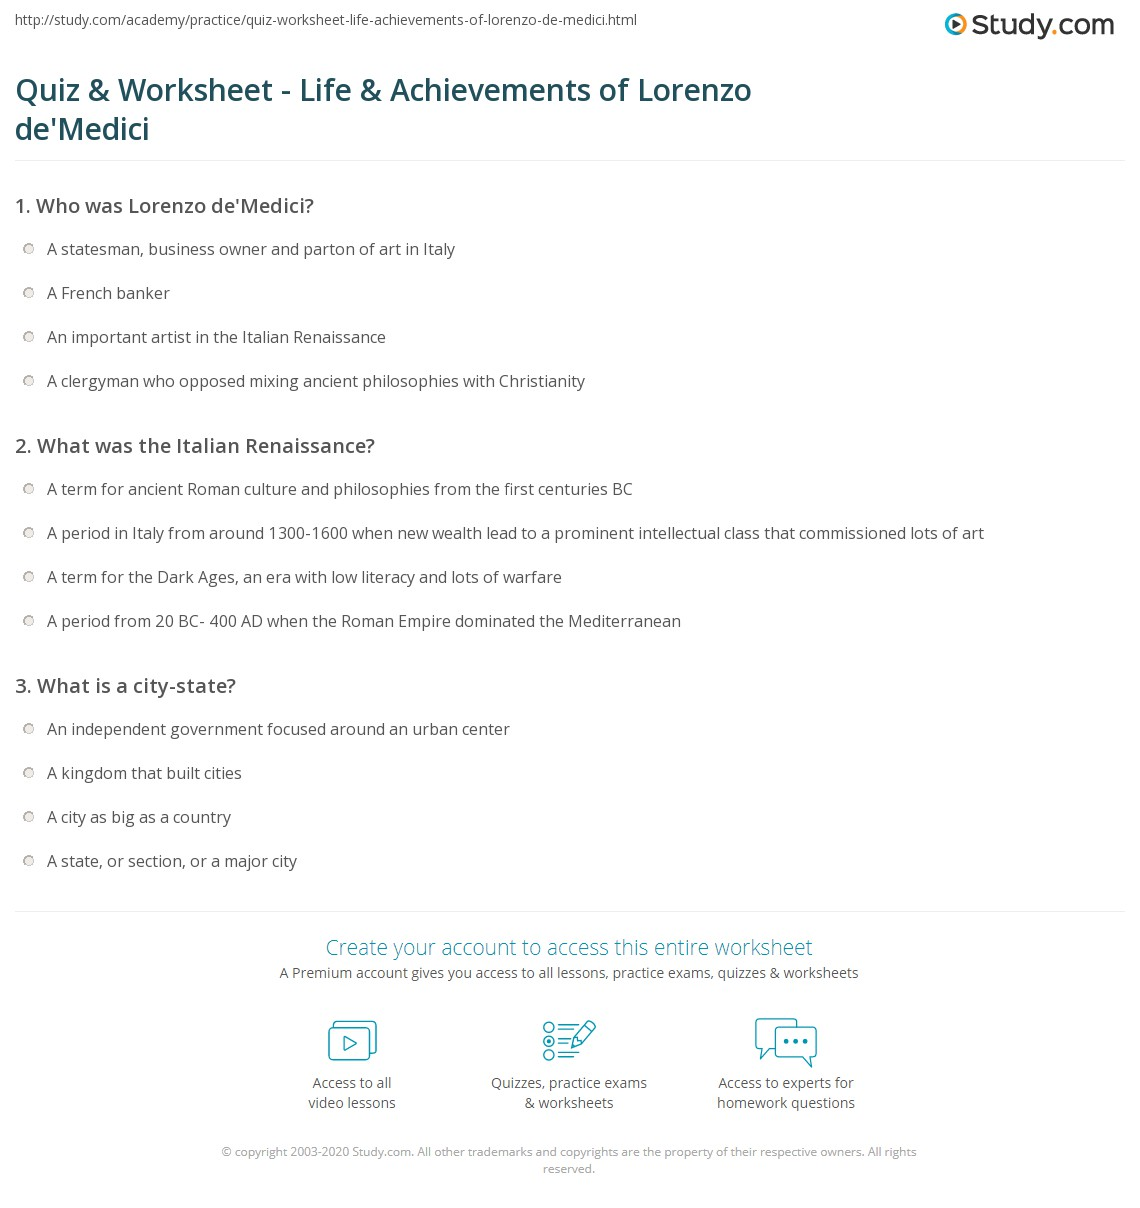 quiz worksheet life achievements of lorenzo de 39 medici. Black Bedroom Furniture Sets. Home Design Ideas